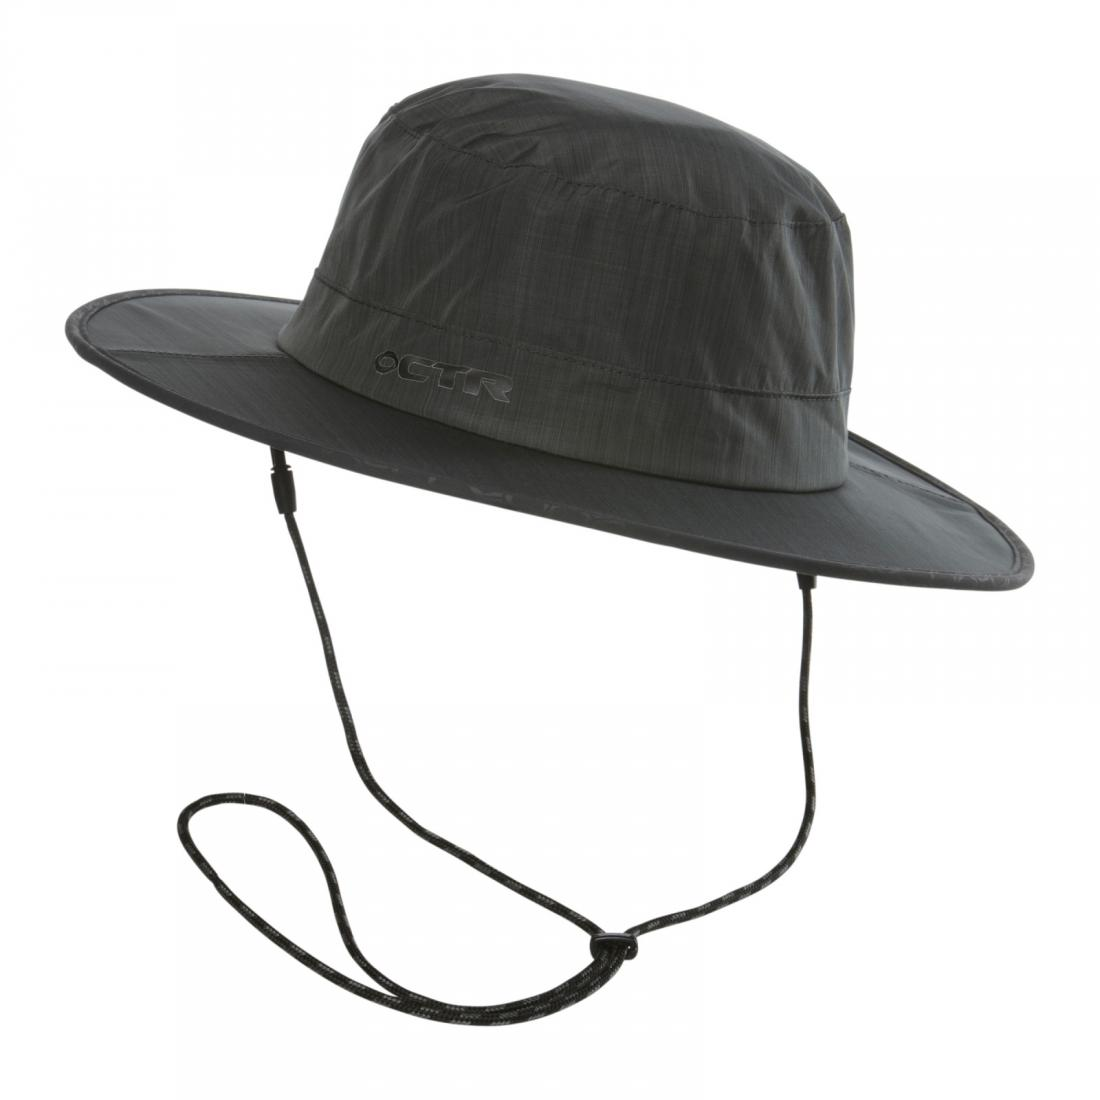 Панама Chaos  Stratus Boat Hat